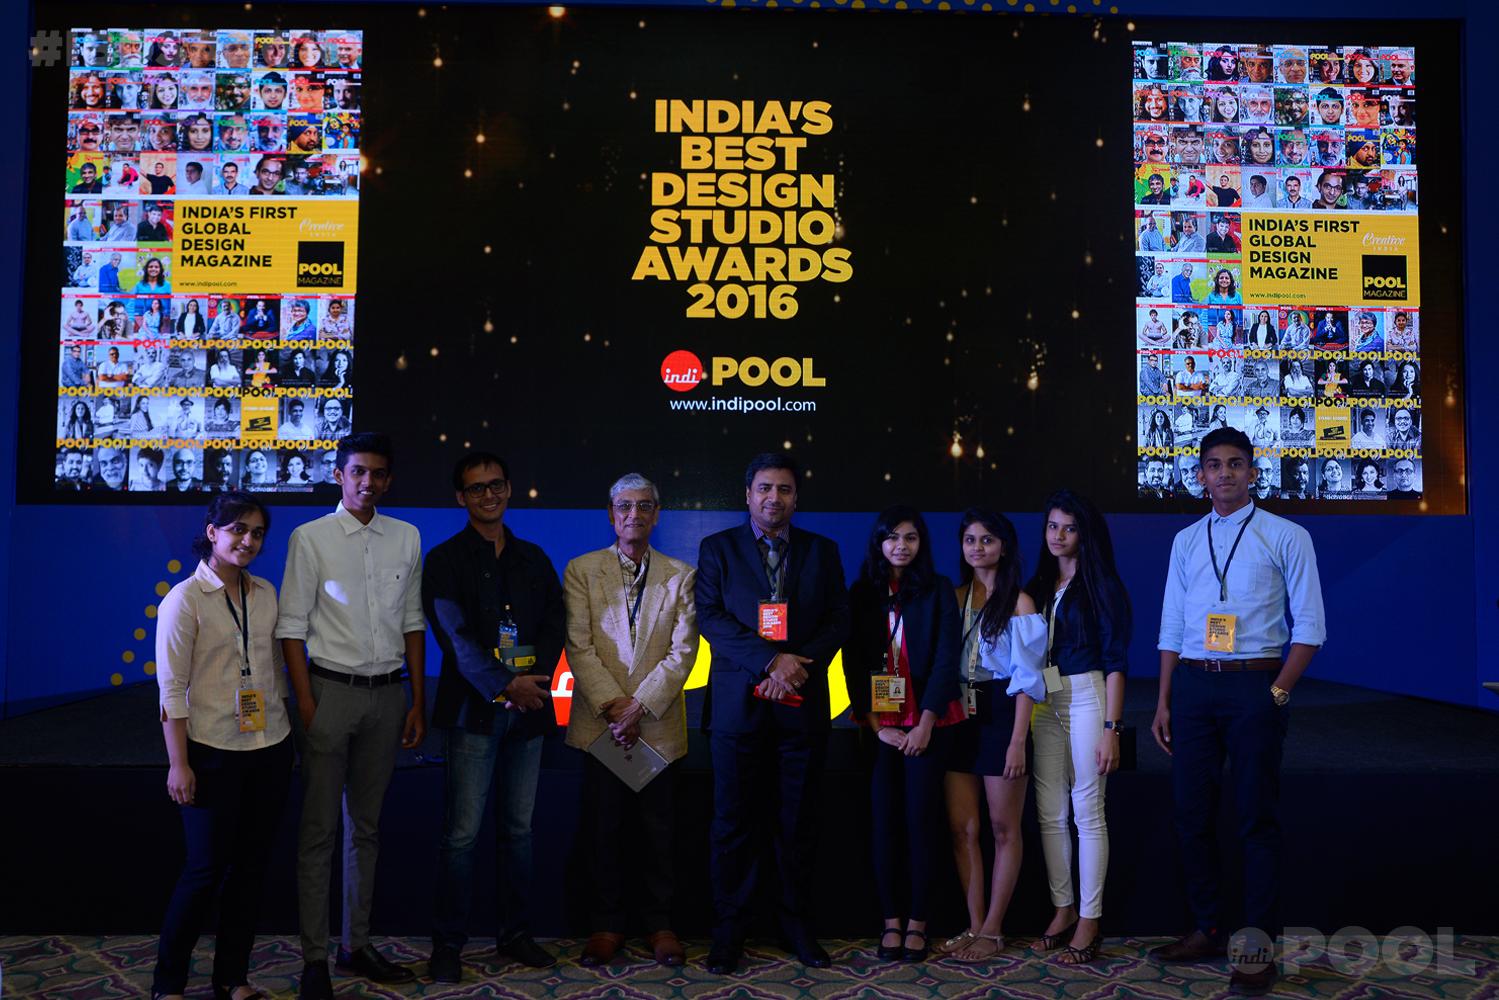 Harsh Manrao, Mookesh Patel and Sudhir Sharma with ISDI Students